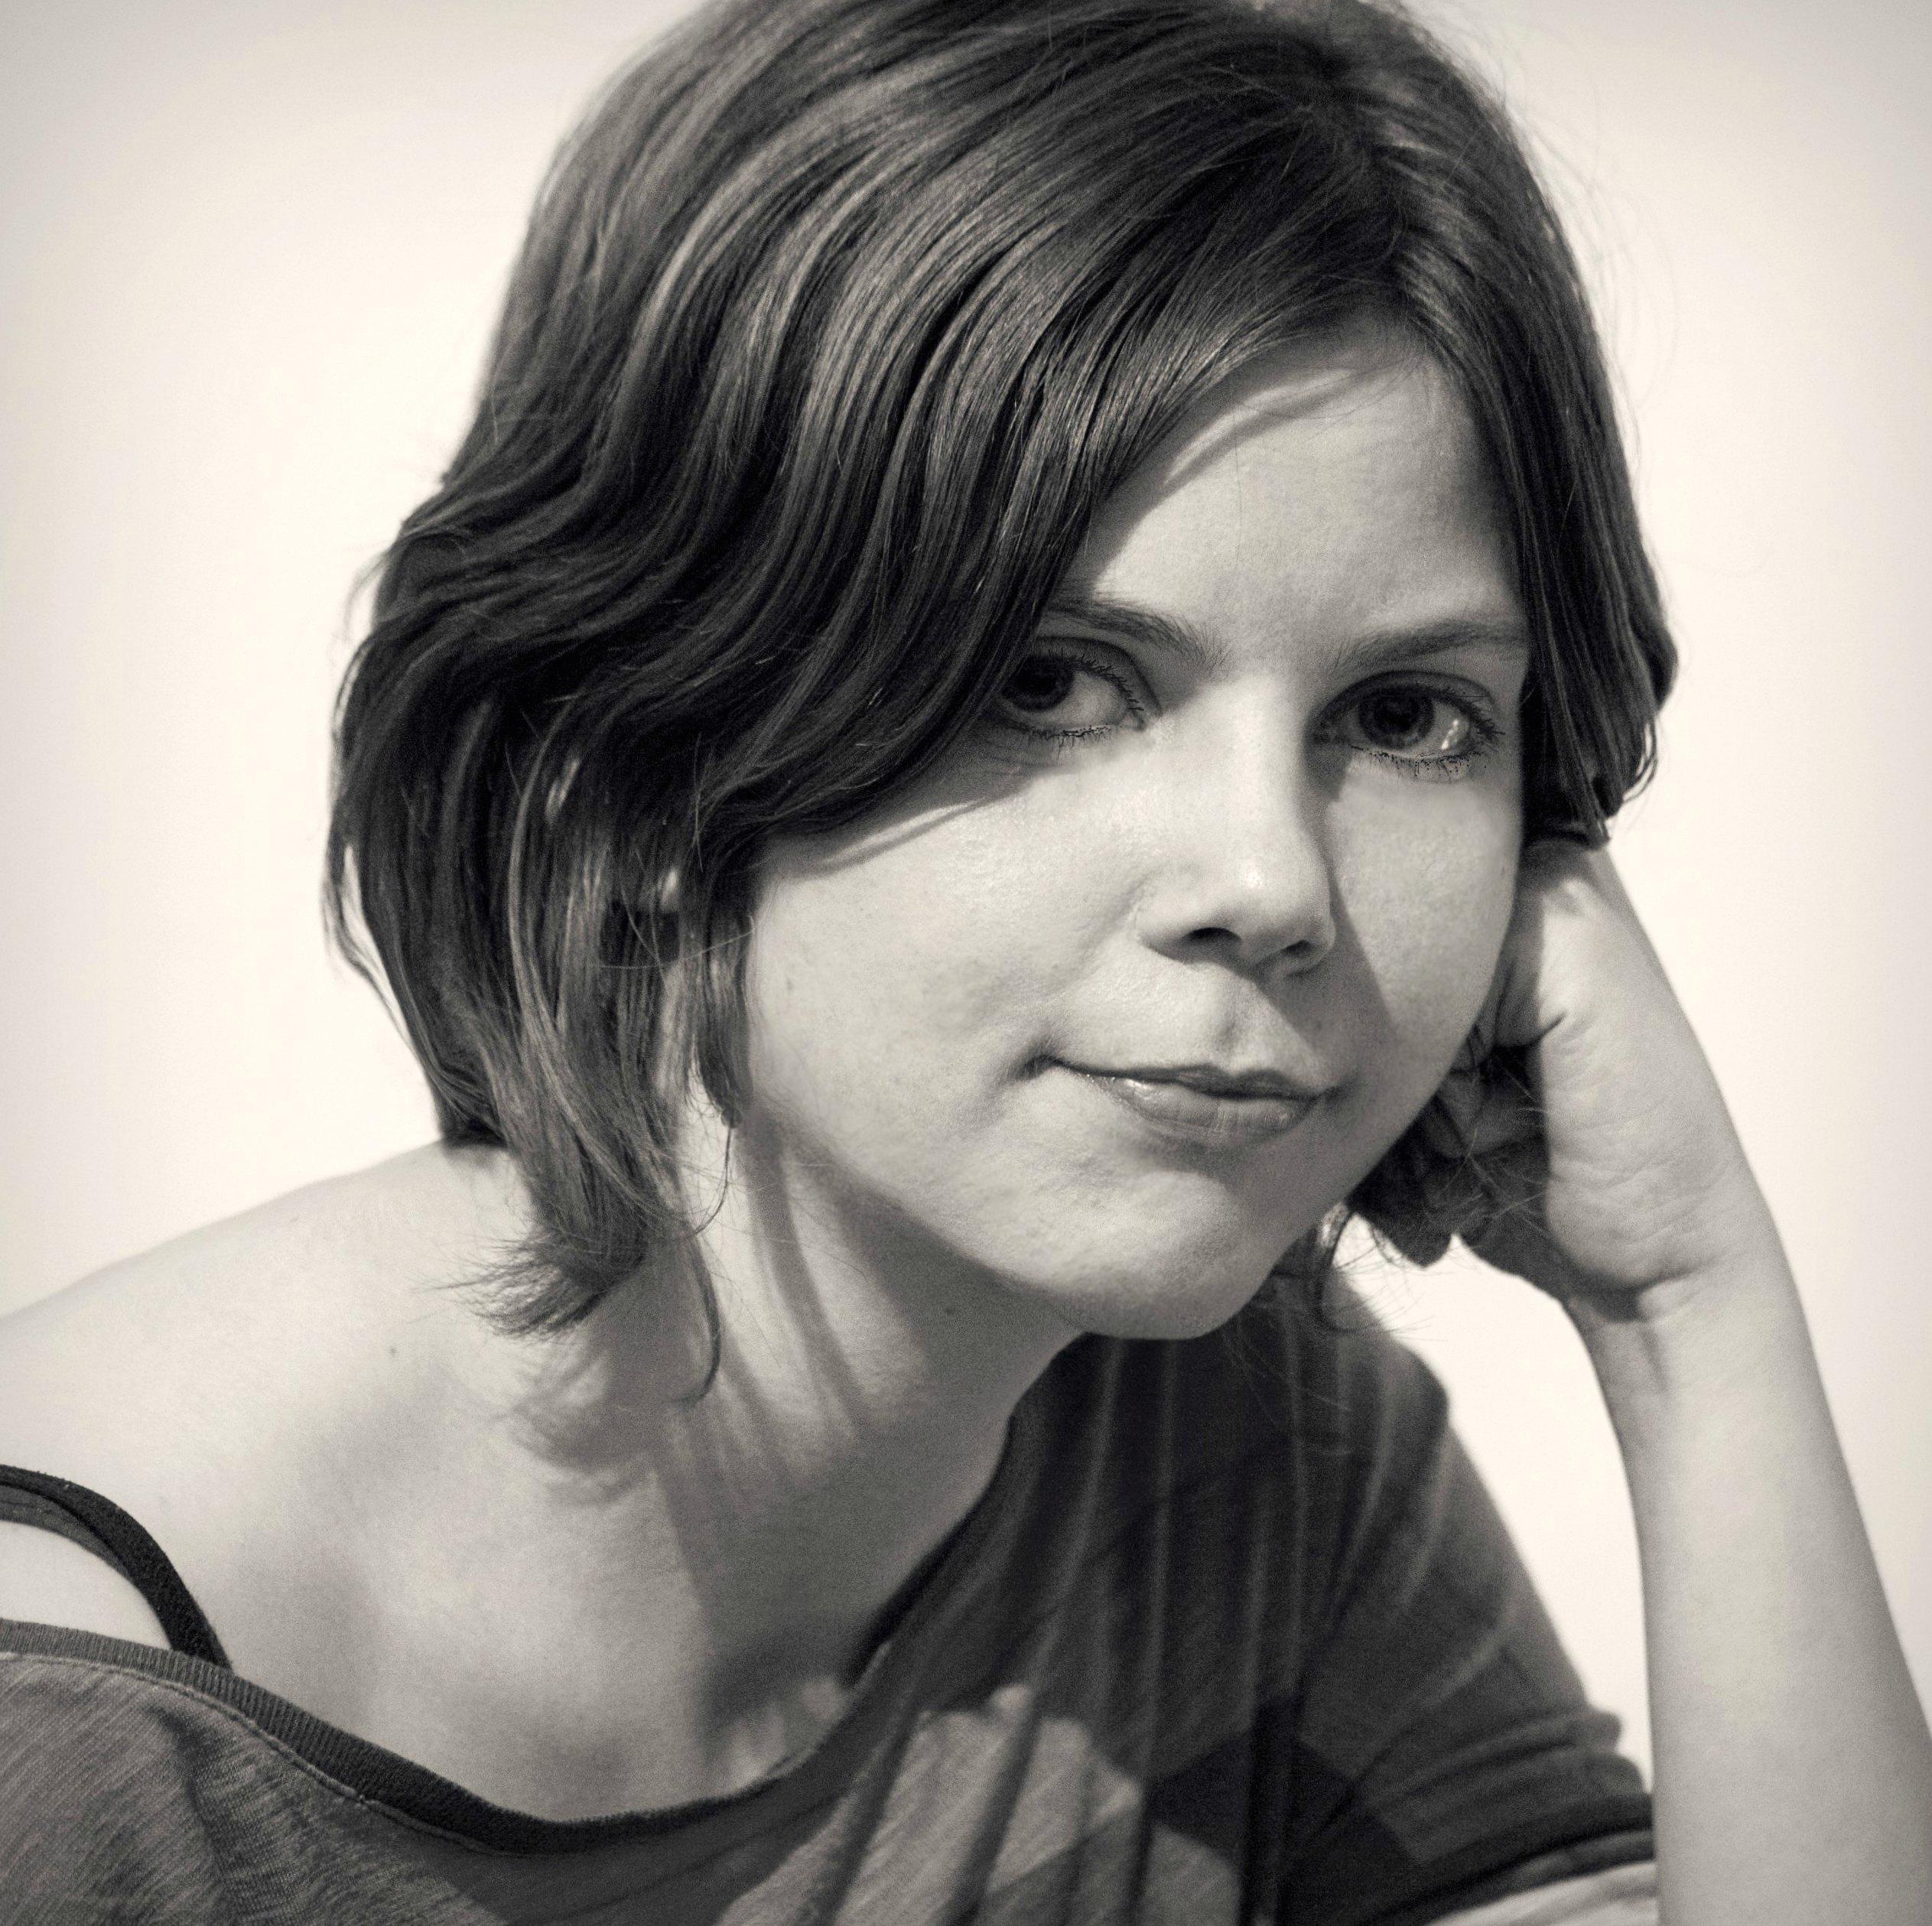 Radmila Jeremic